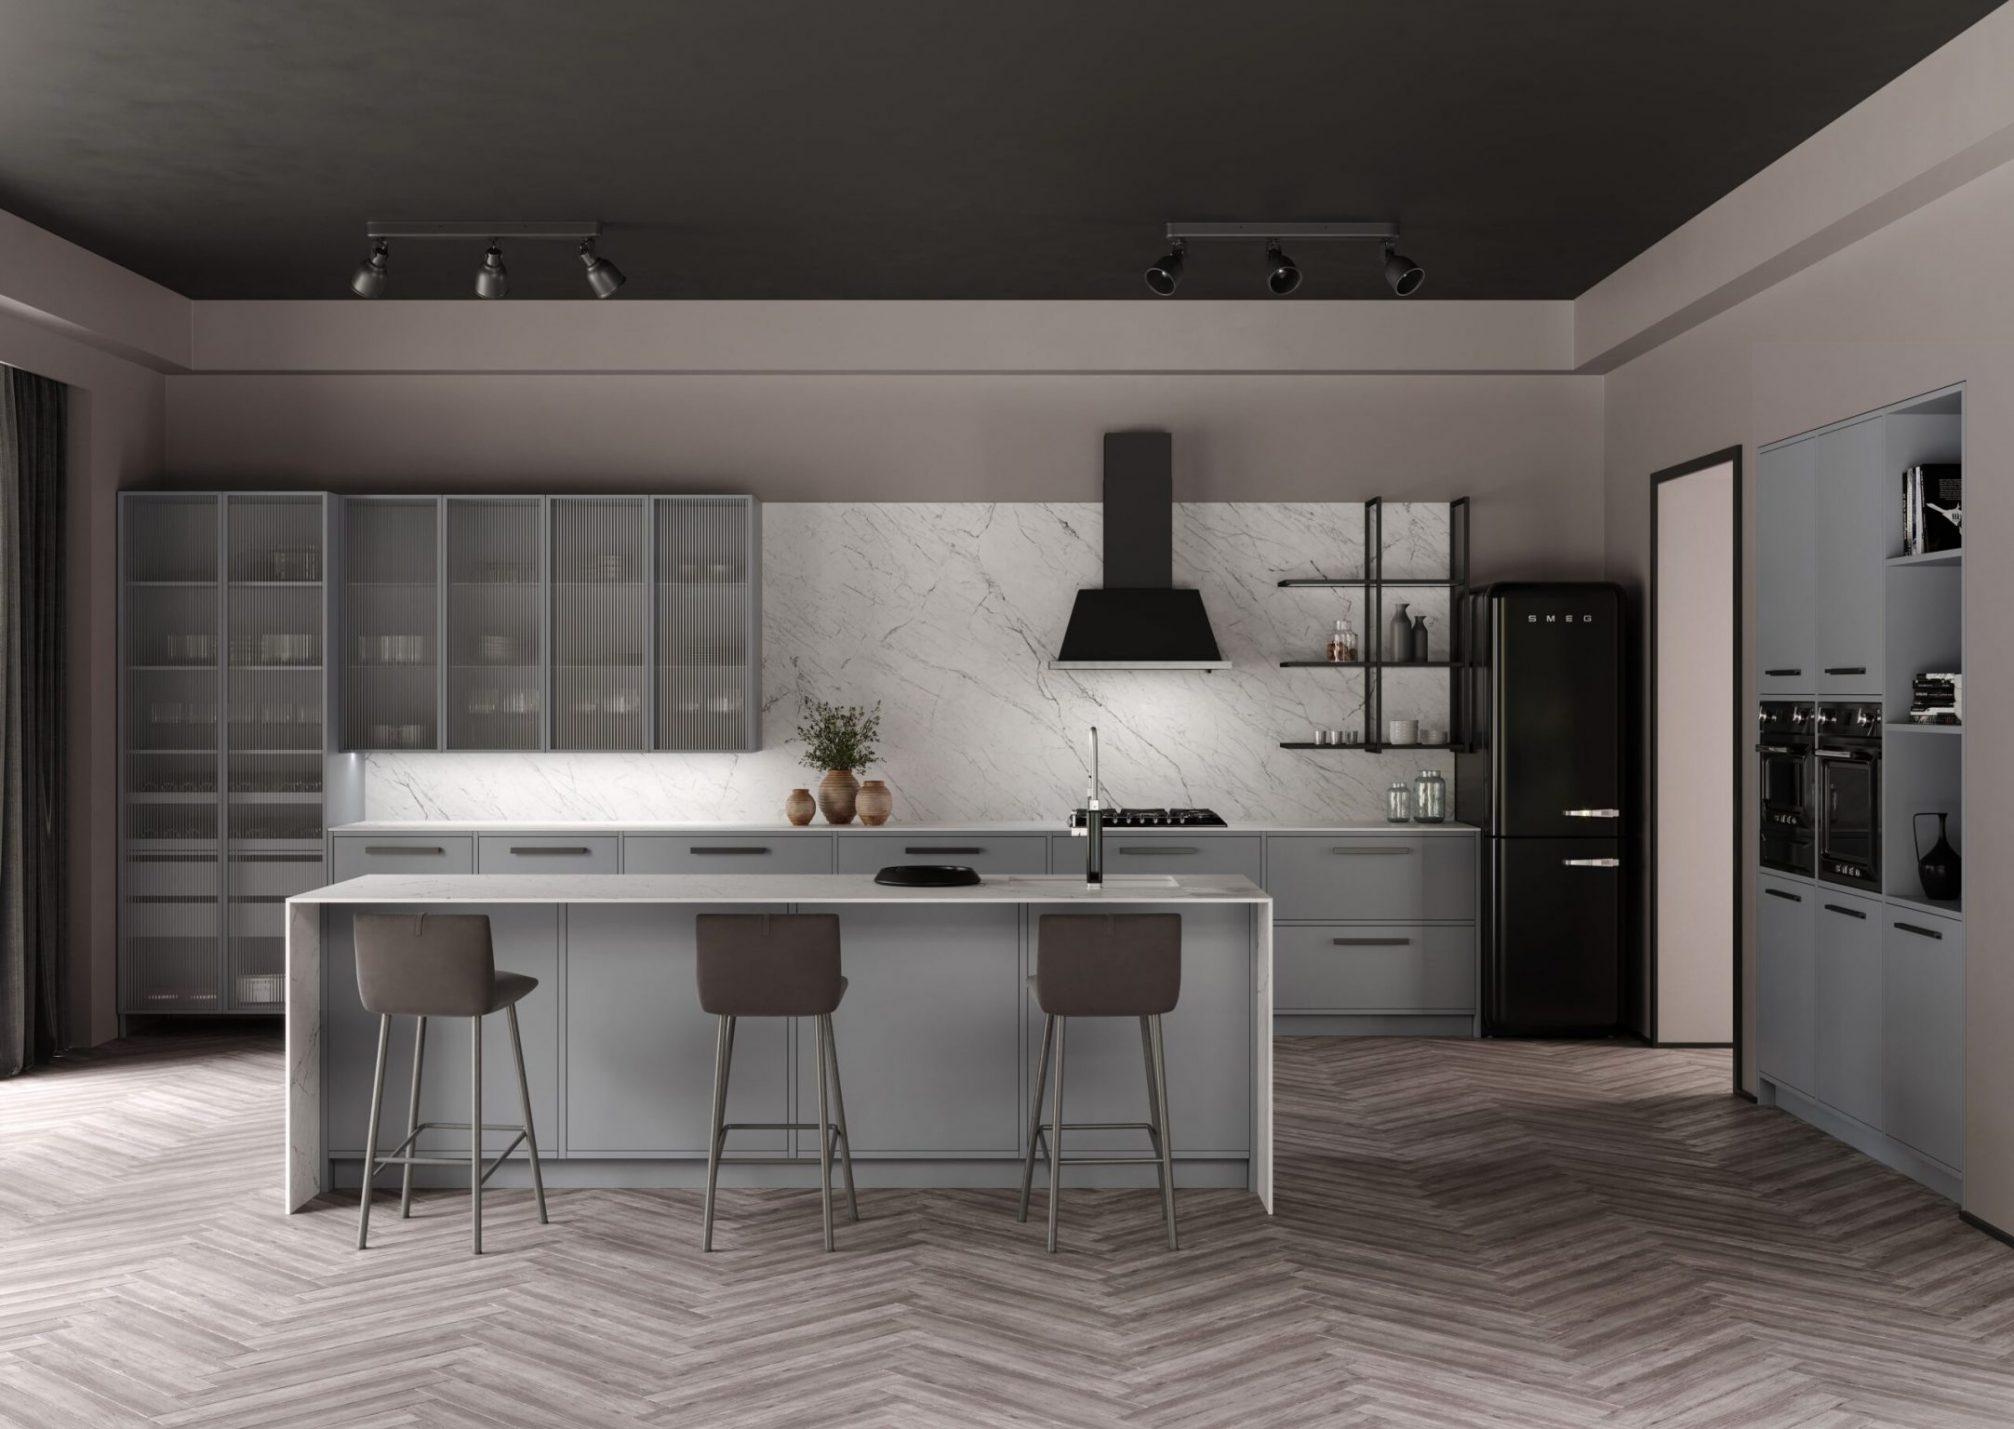 kitchen_studio_hygge_9-scaled